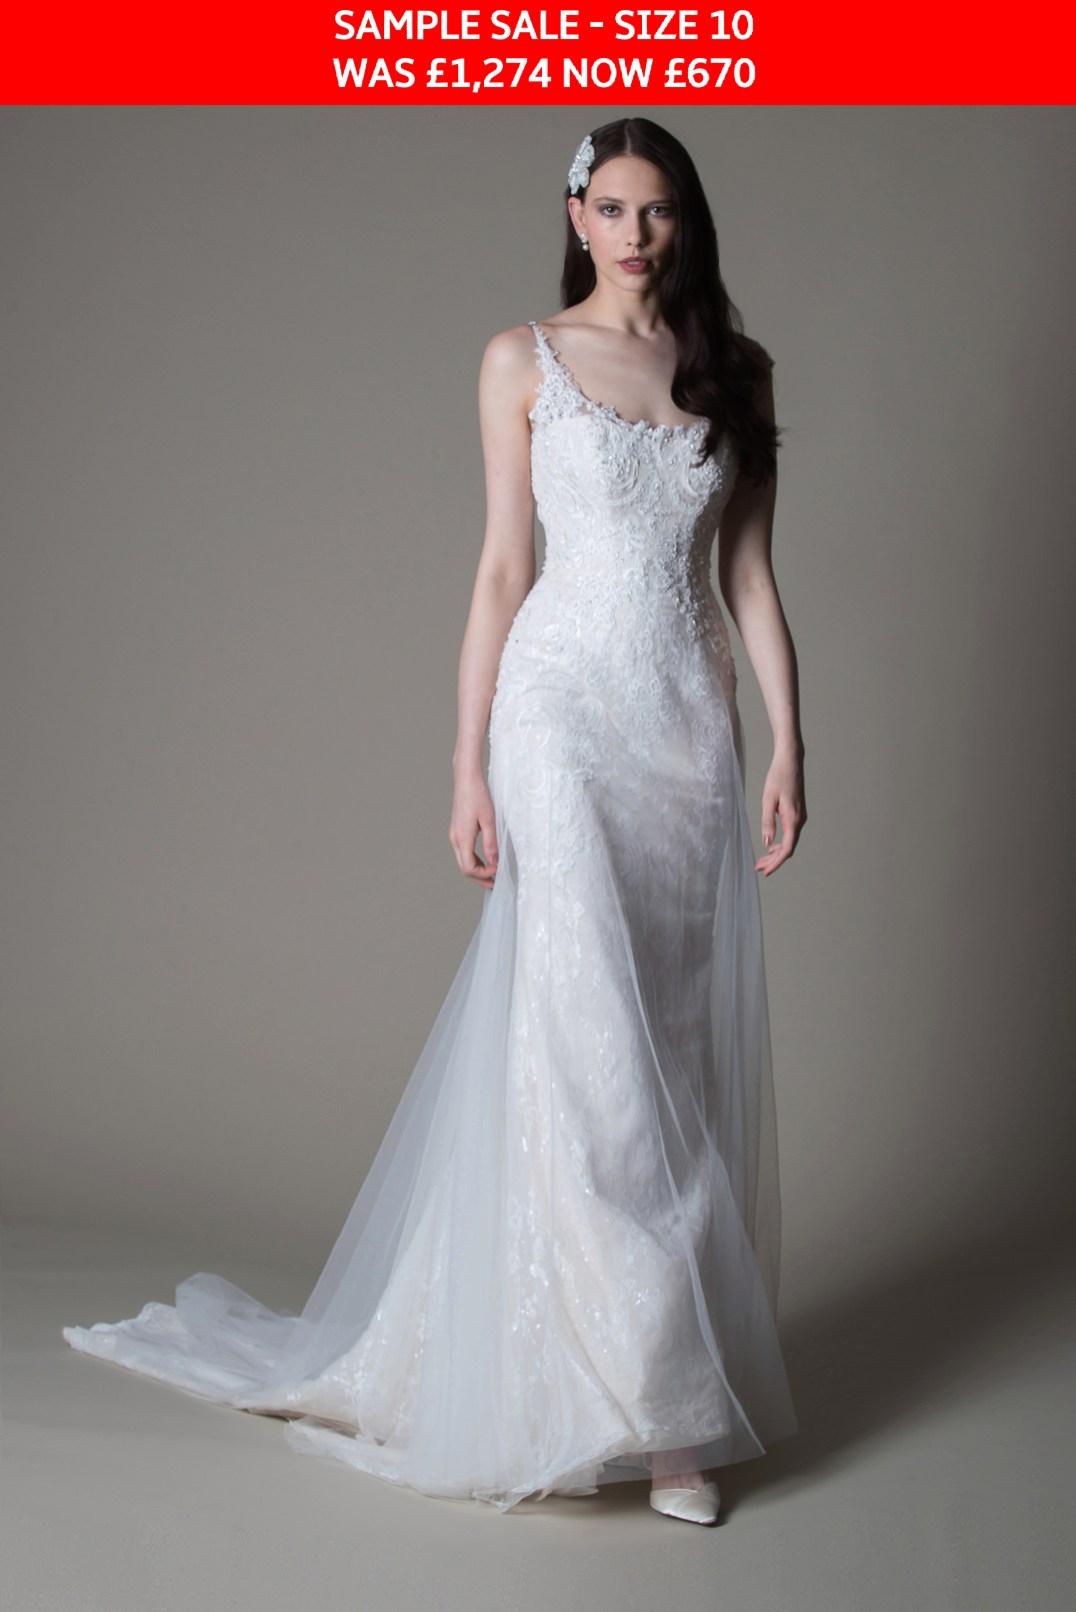 MiaMia Abigail bridal gown sample sale